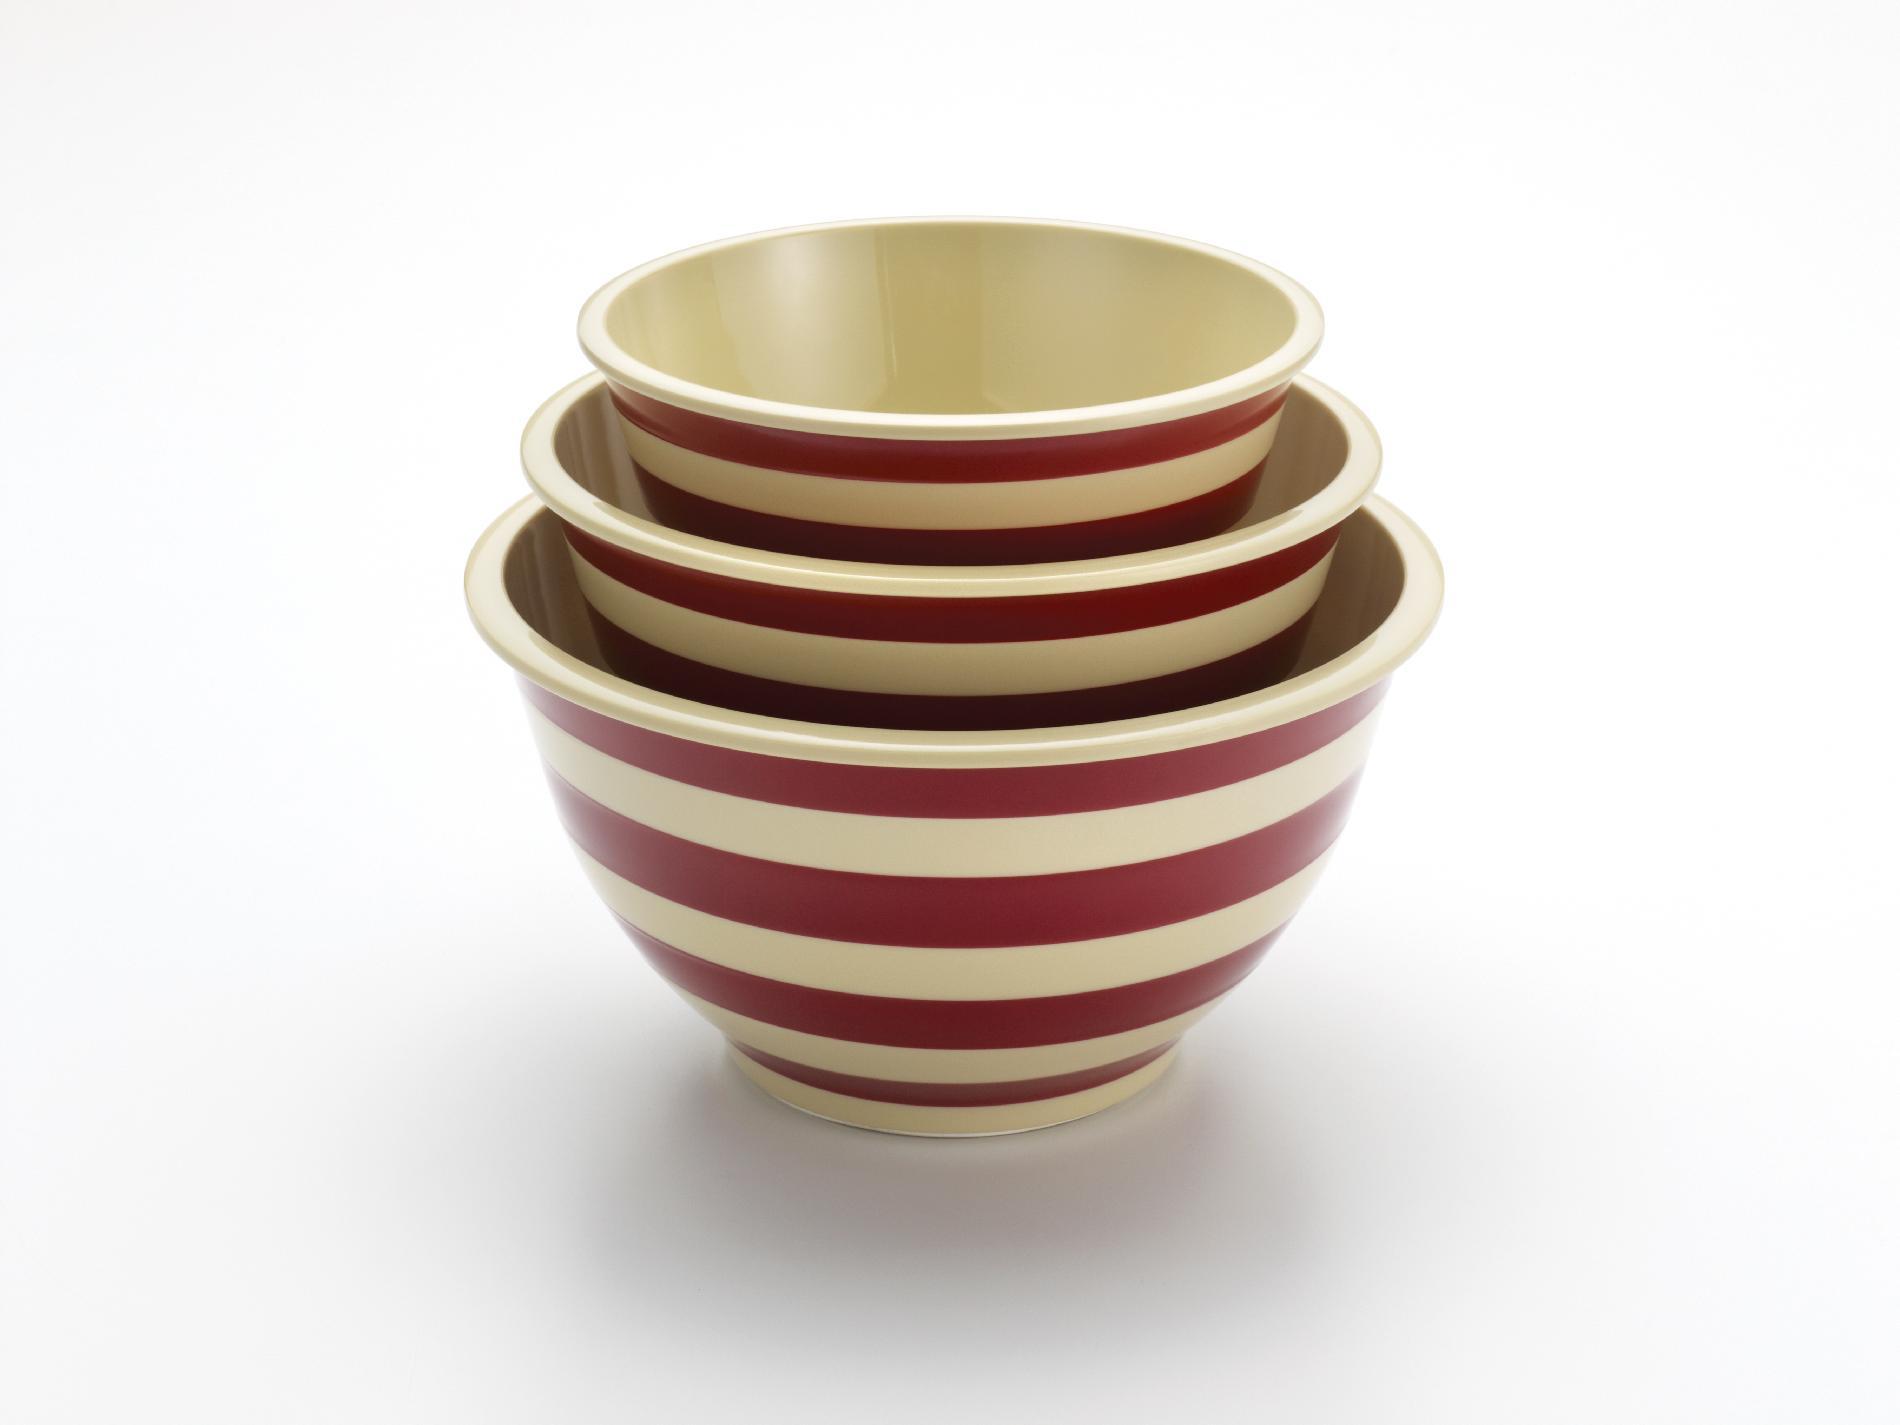 Paula Deen Signature Pantryware 3-Piece Striped Mixing Bowl Set, Red Stripe PartNumber: 00837061000P KsnValue: 5775657 MfgPartNumber: 57528